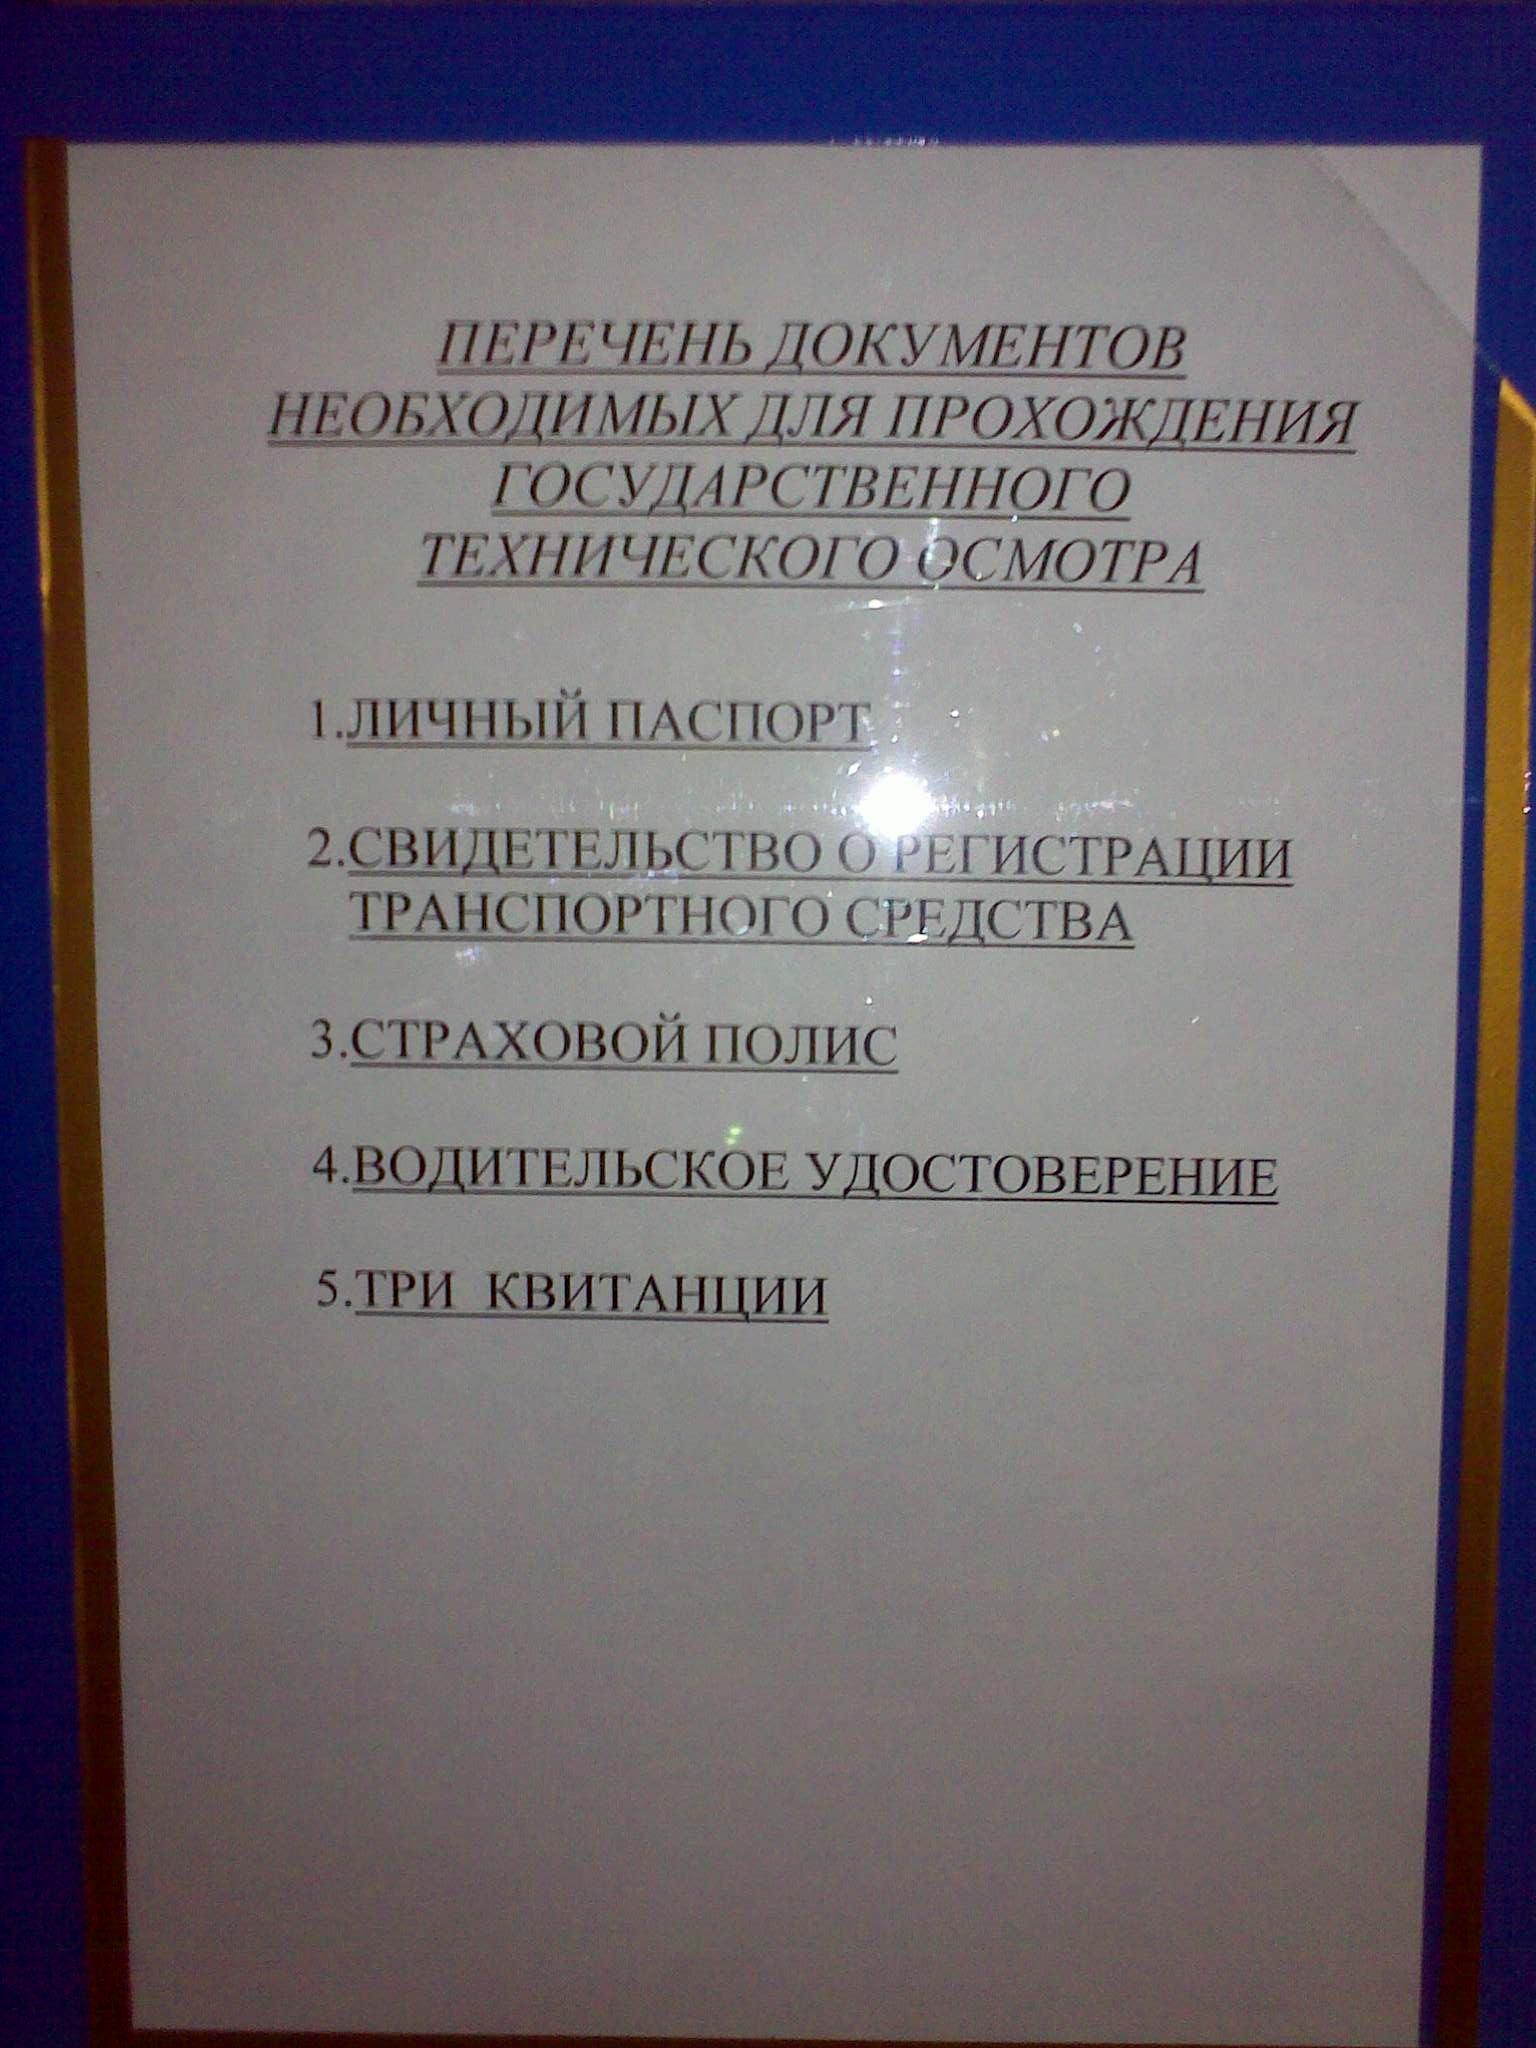 http://forum.darnet.ru/img_attach/762.jpg